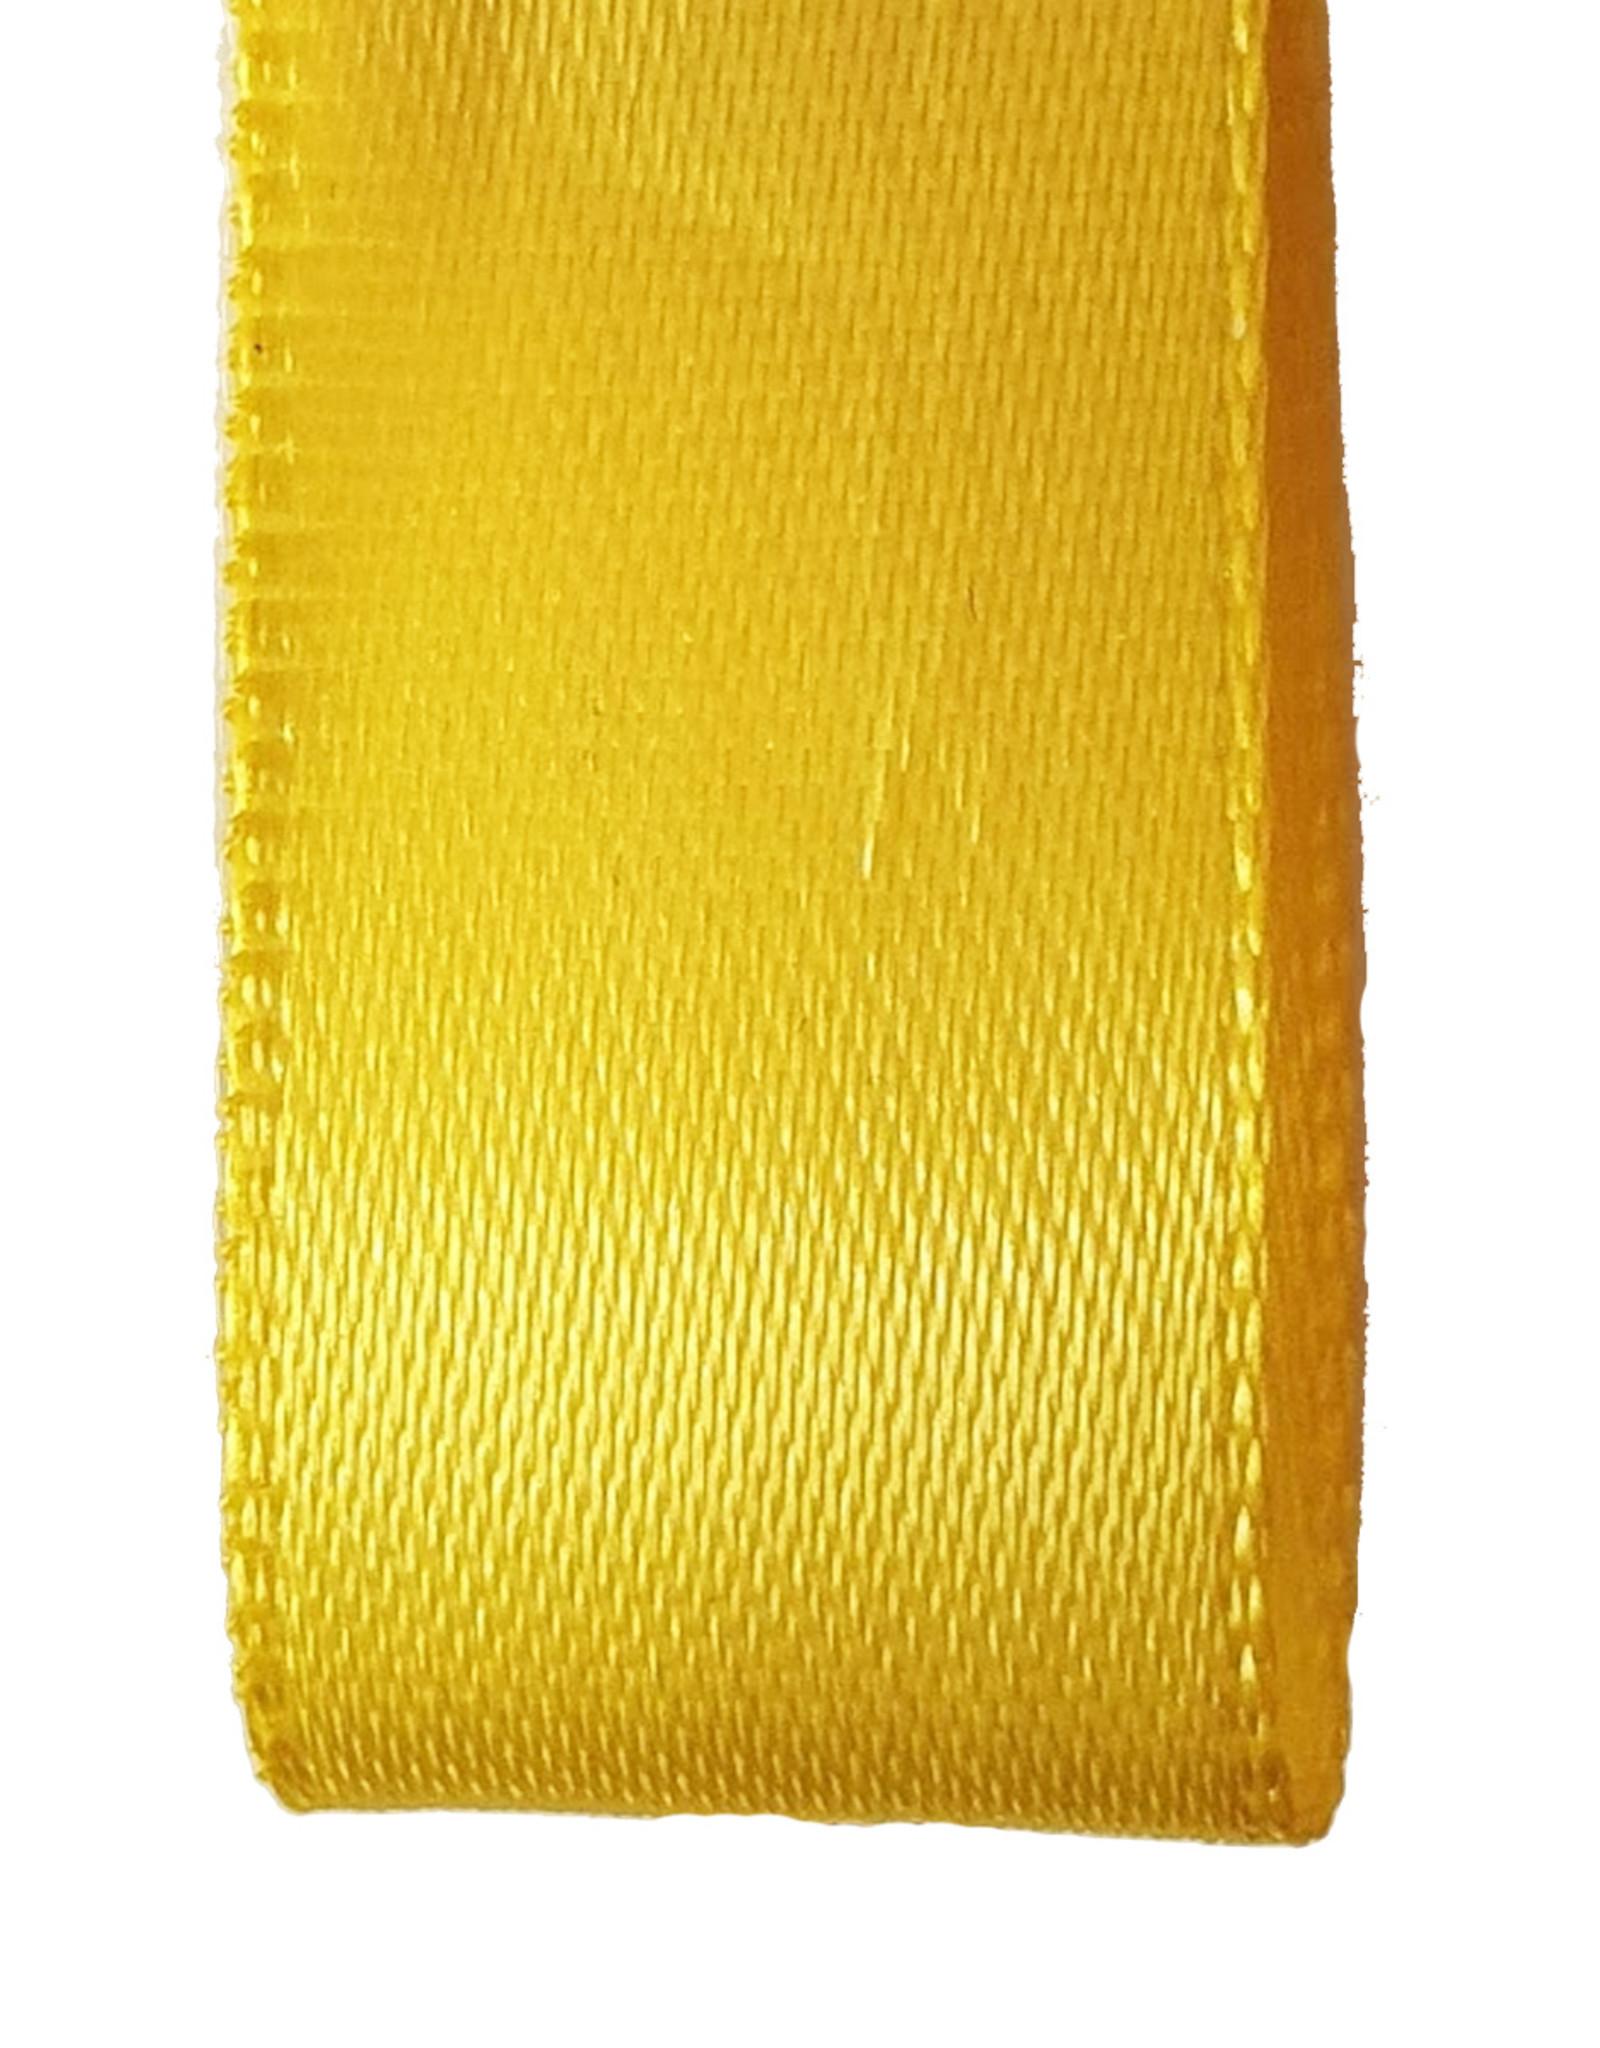 Double face satin ribbon - Yellow (25 m.)